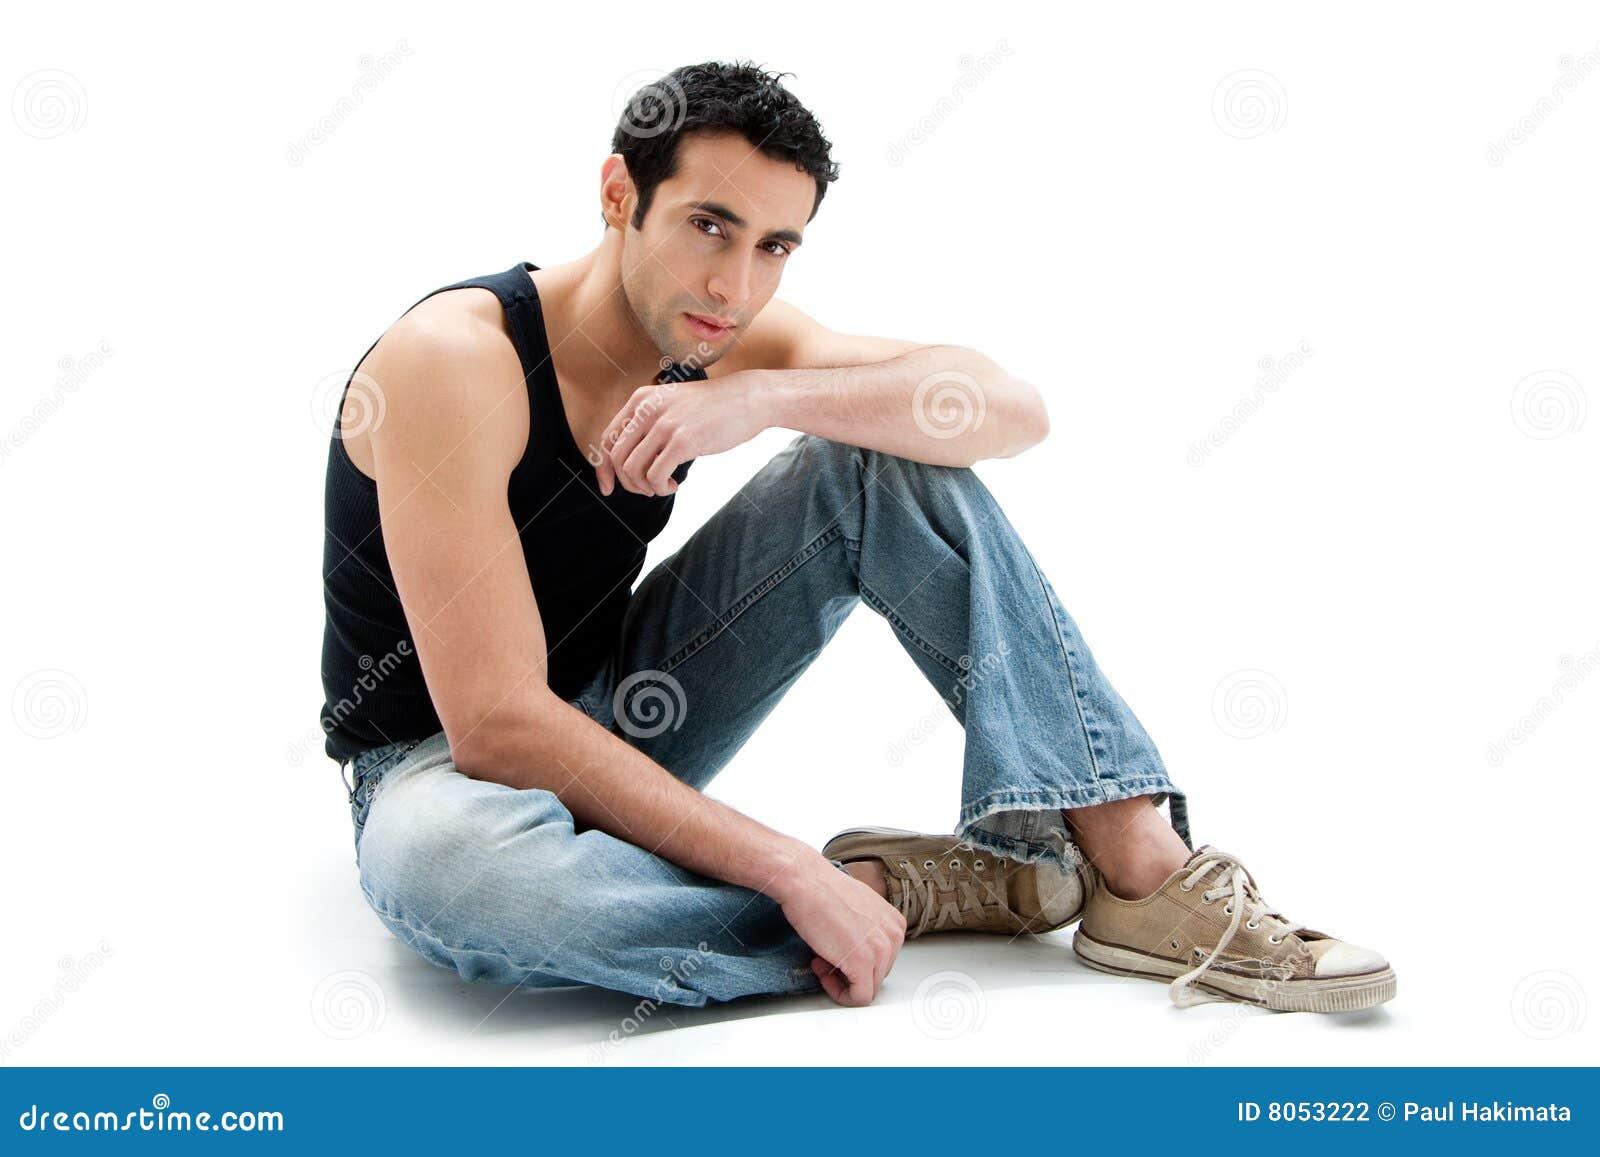 handsome guy sitting on floor stock photo image of jeans. Black Bedroom Furniture Sets. Home Design Ideas